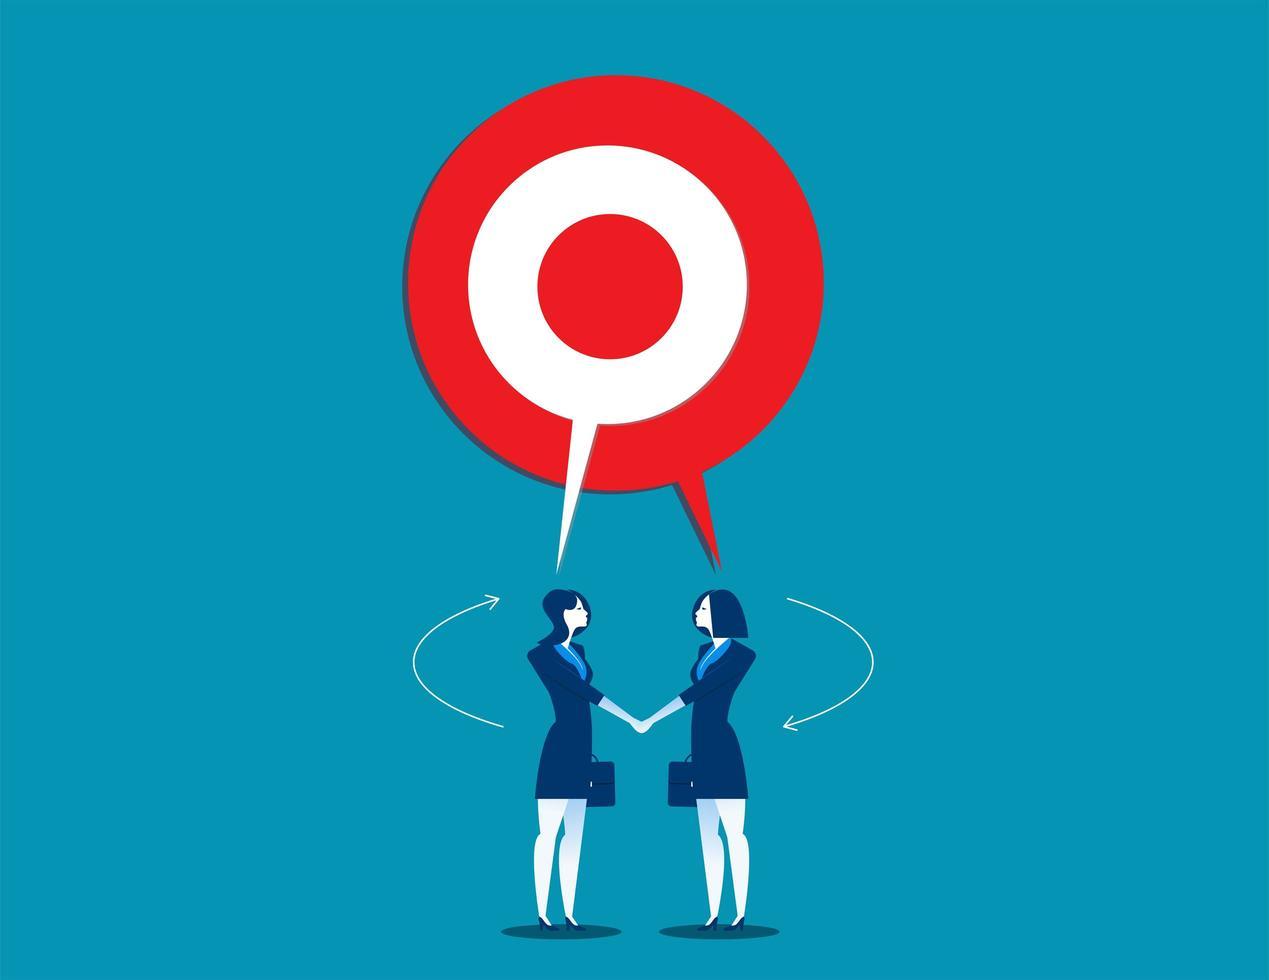 Businesswomen Talking with Shared Target Speech Bubble vector